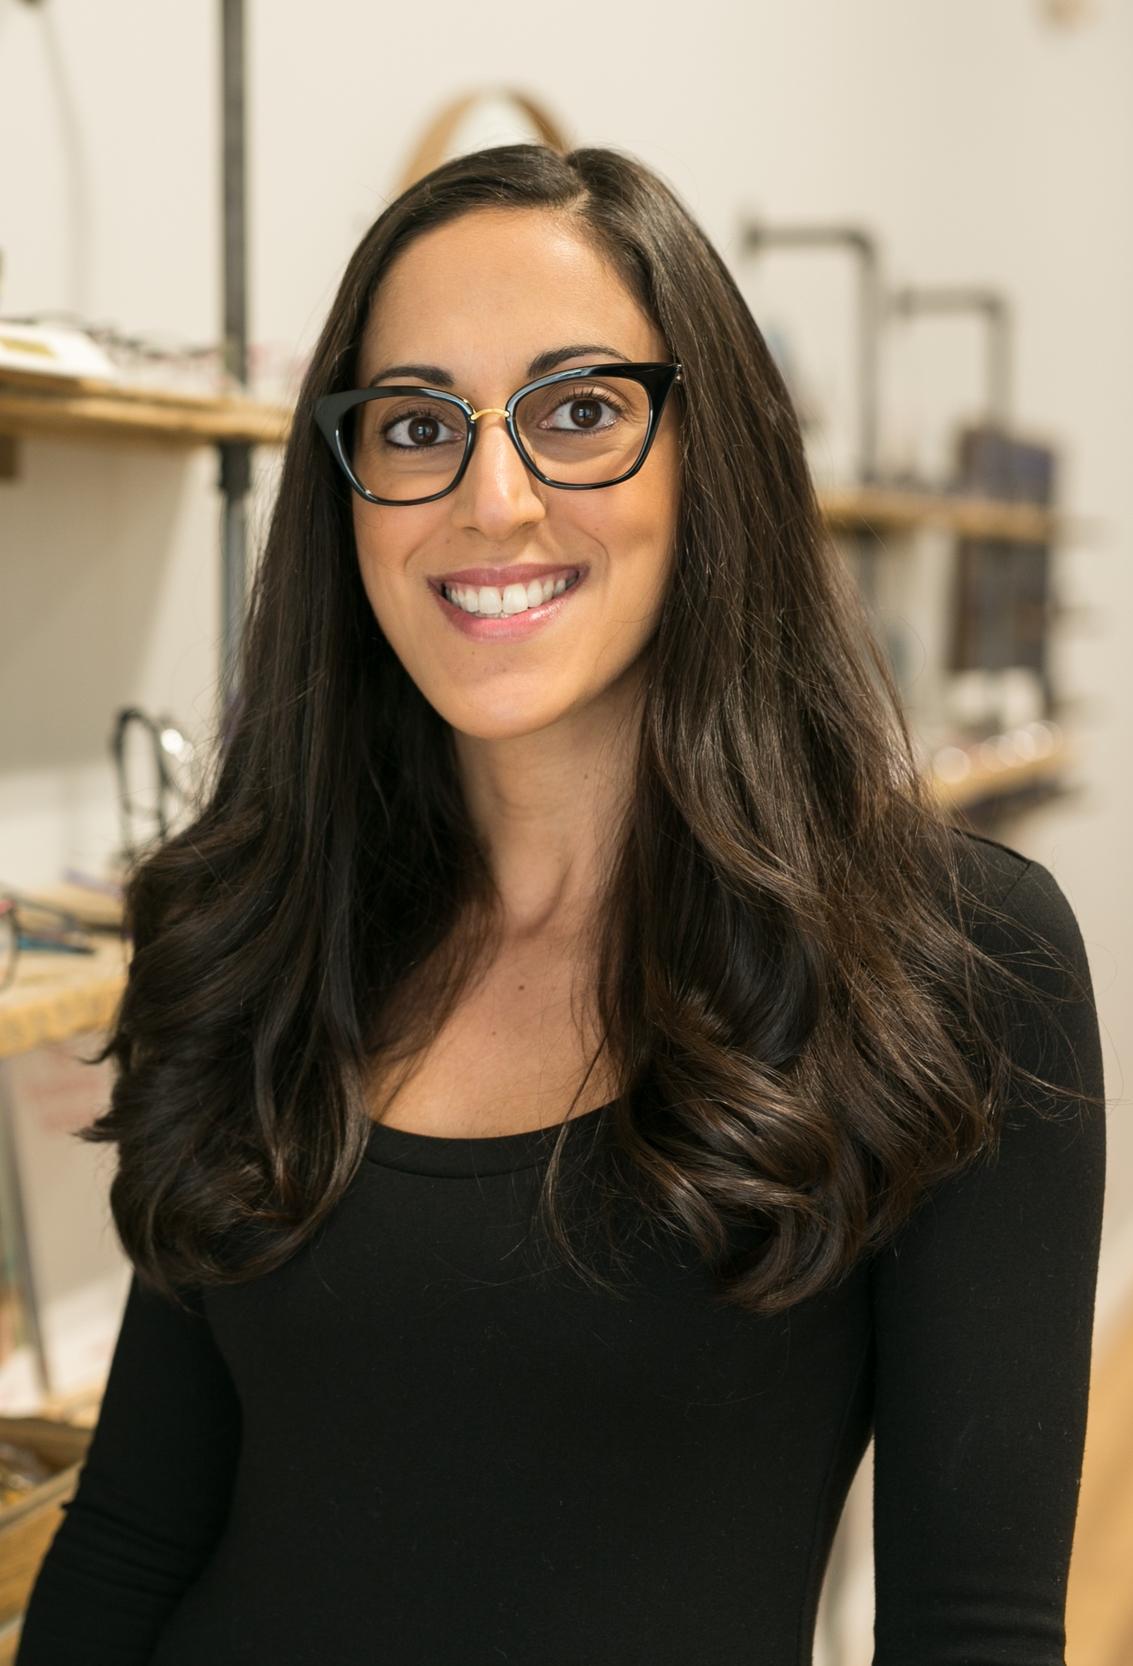 Dr. Monica Johnsonbaugh Focus 313 Eyecare